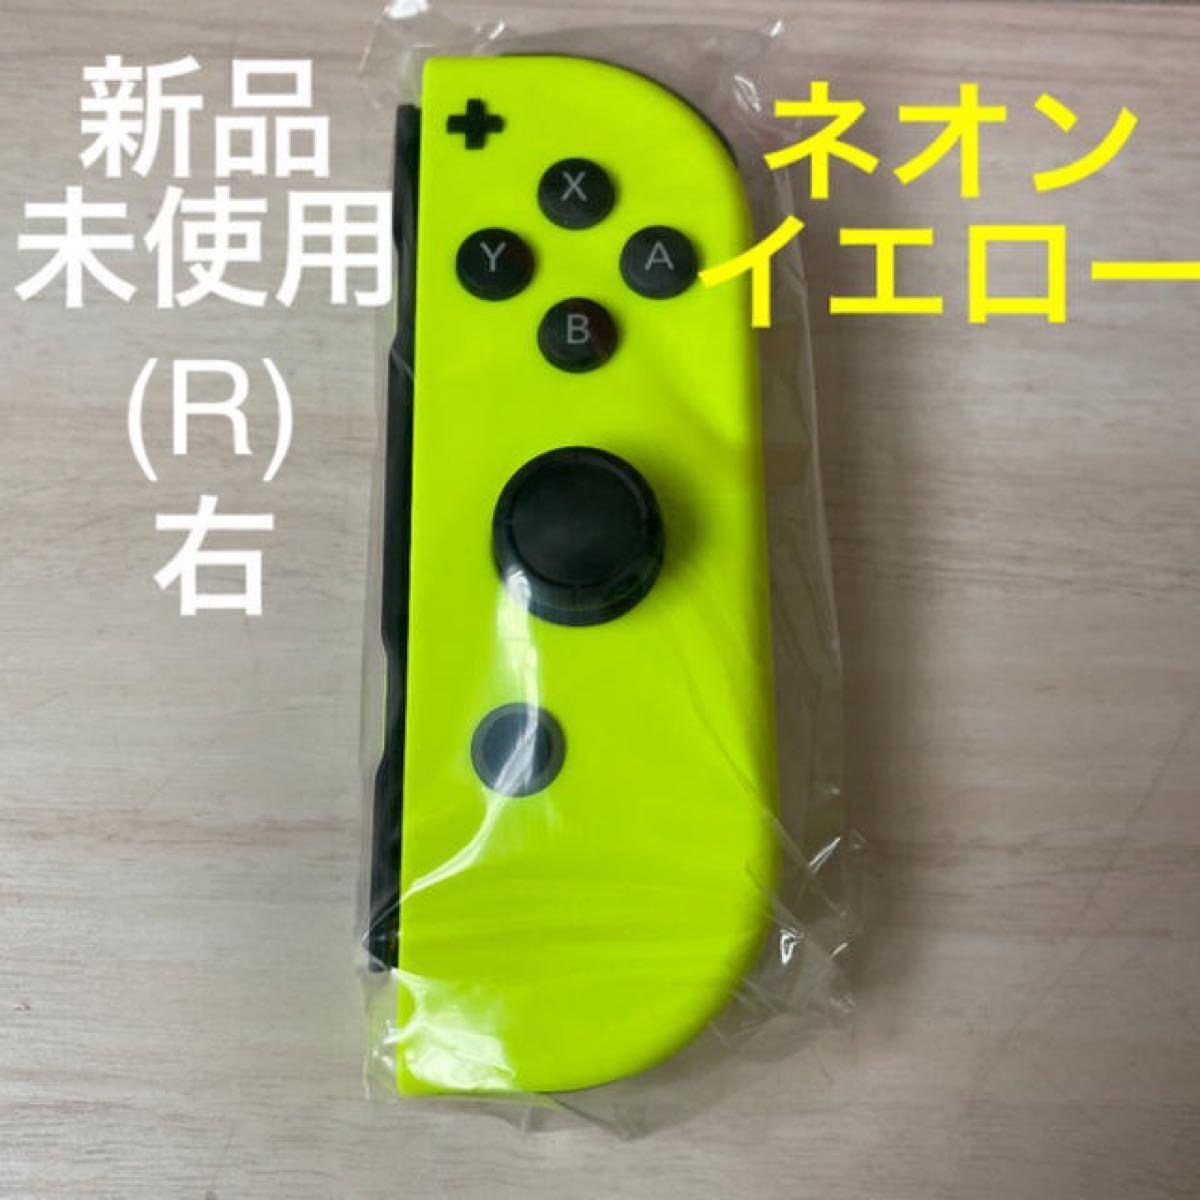 Switchジョイコン(R)右 ネオンイエロー